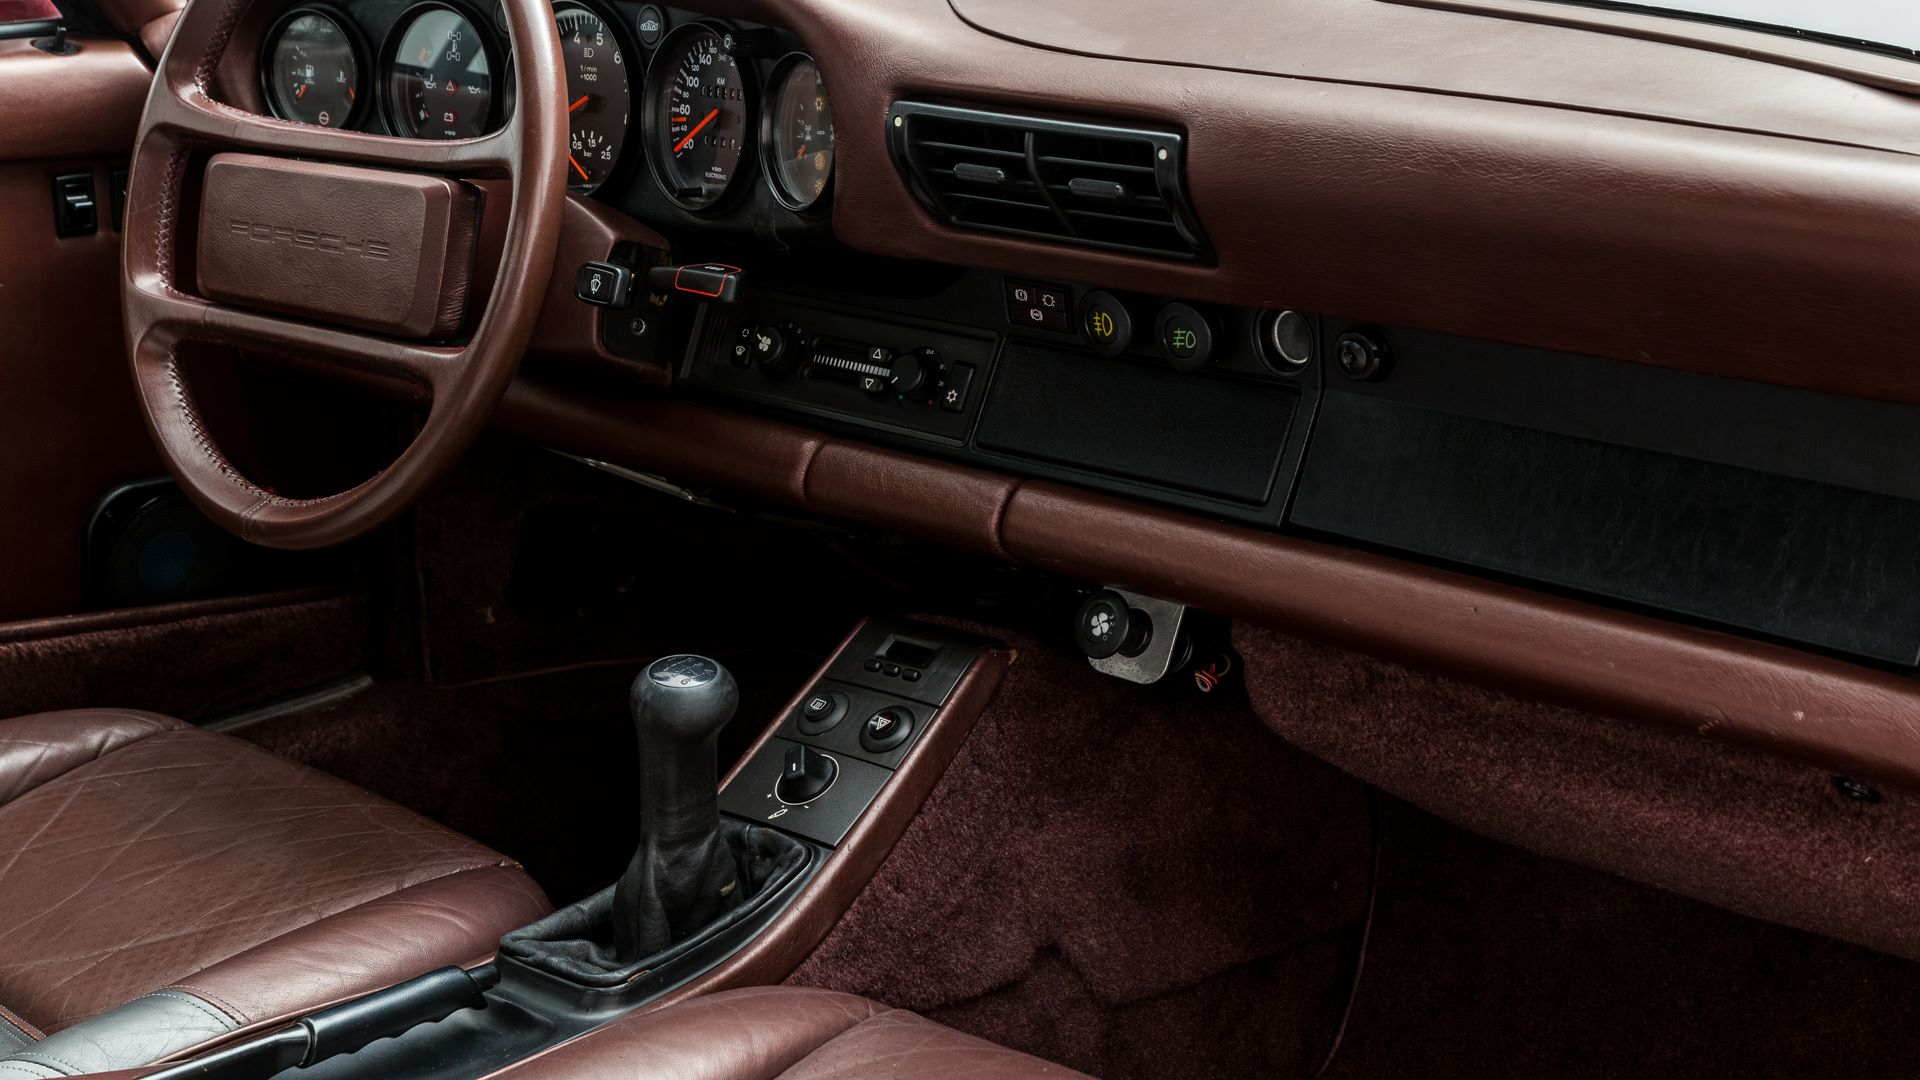 Porsche-959-Prototype-1985-for-sale-15